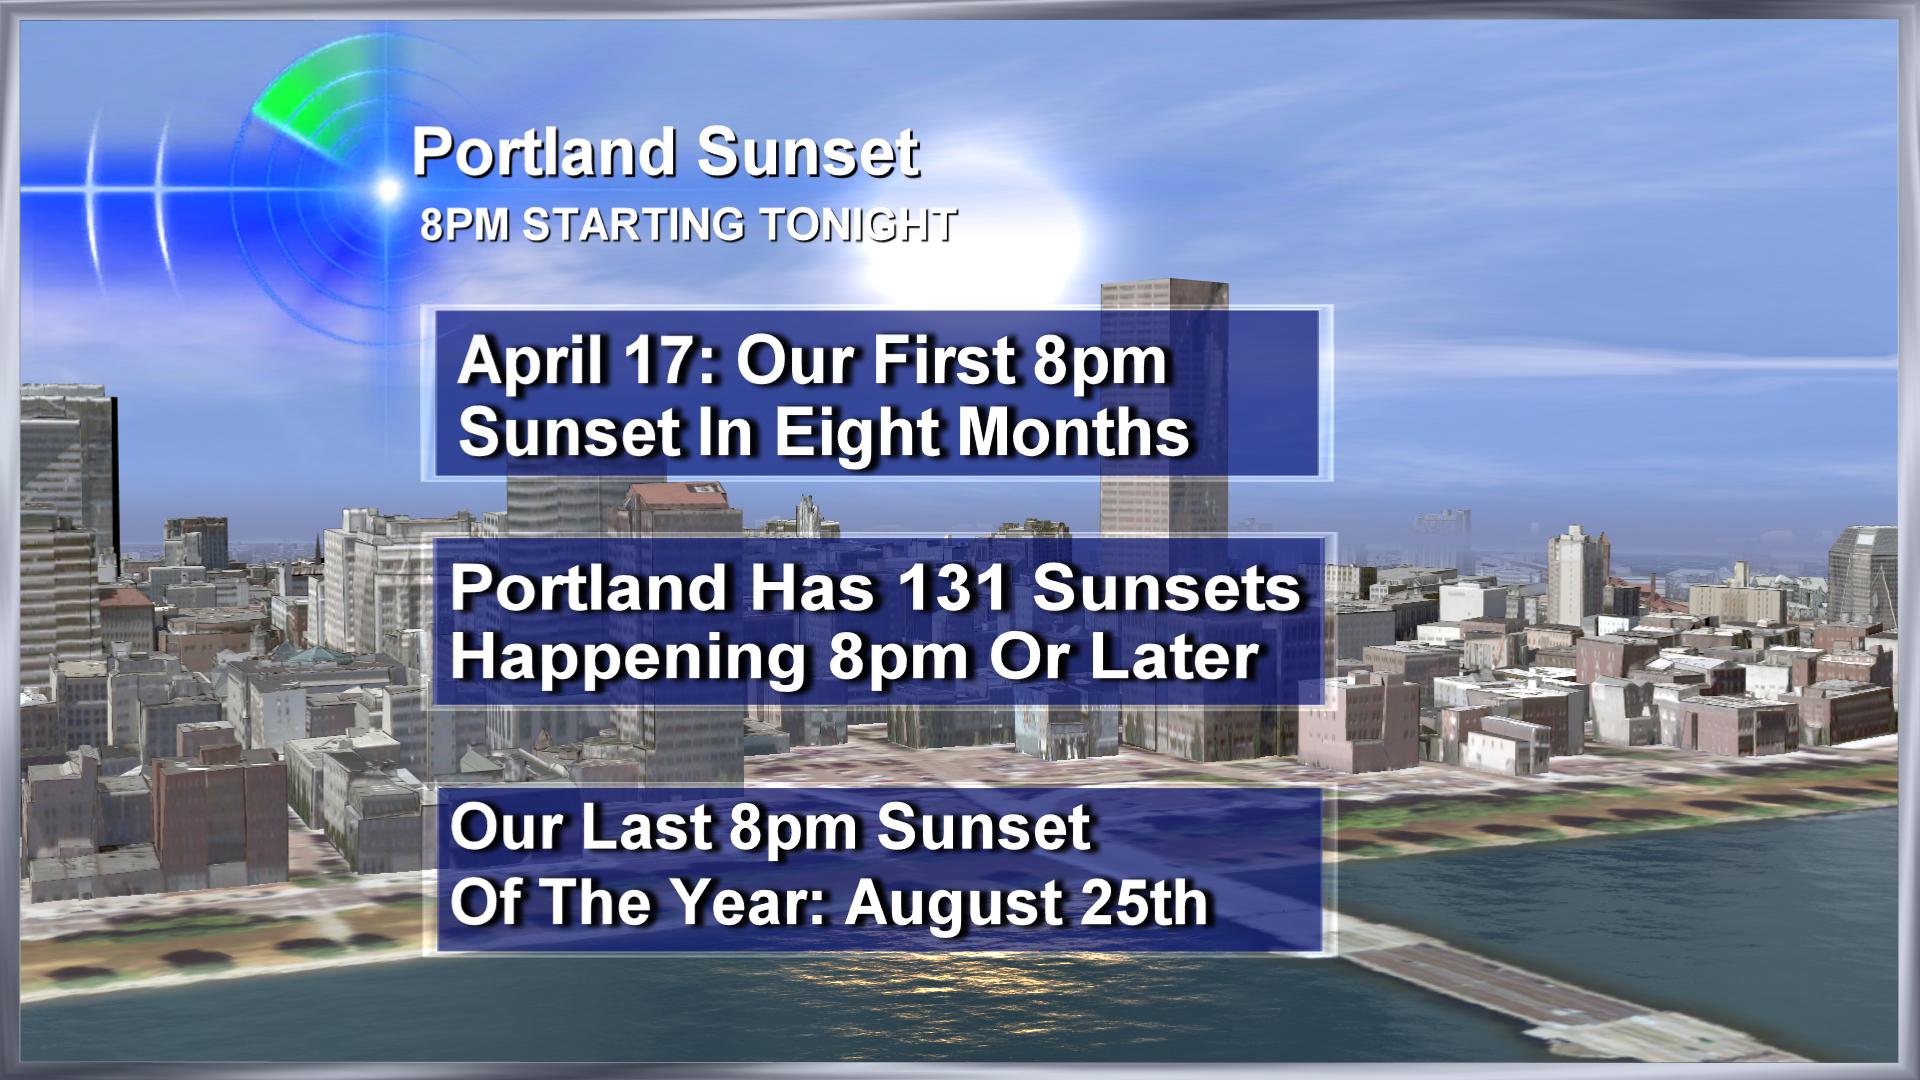 portland-sunset-times